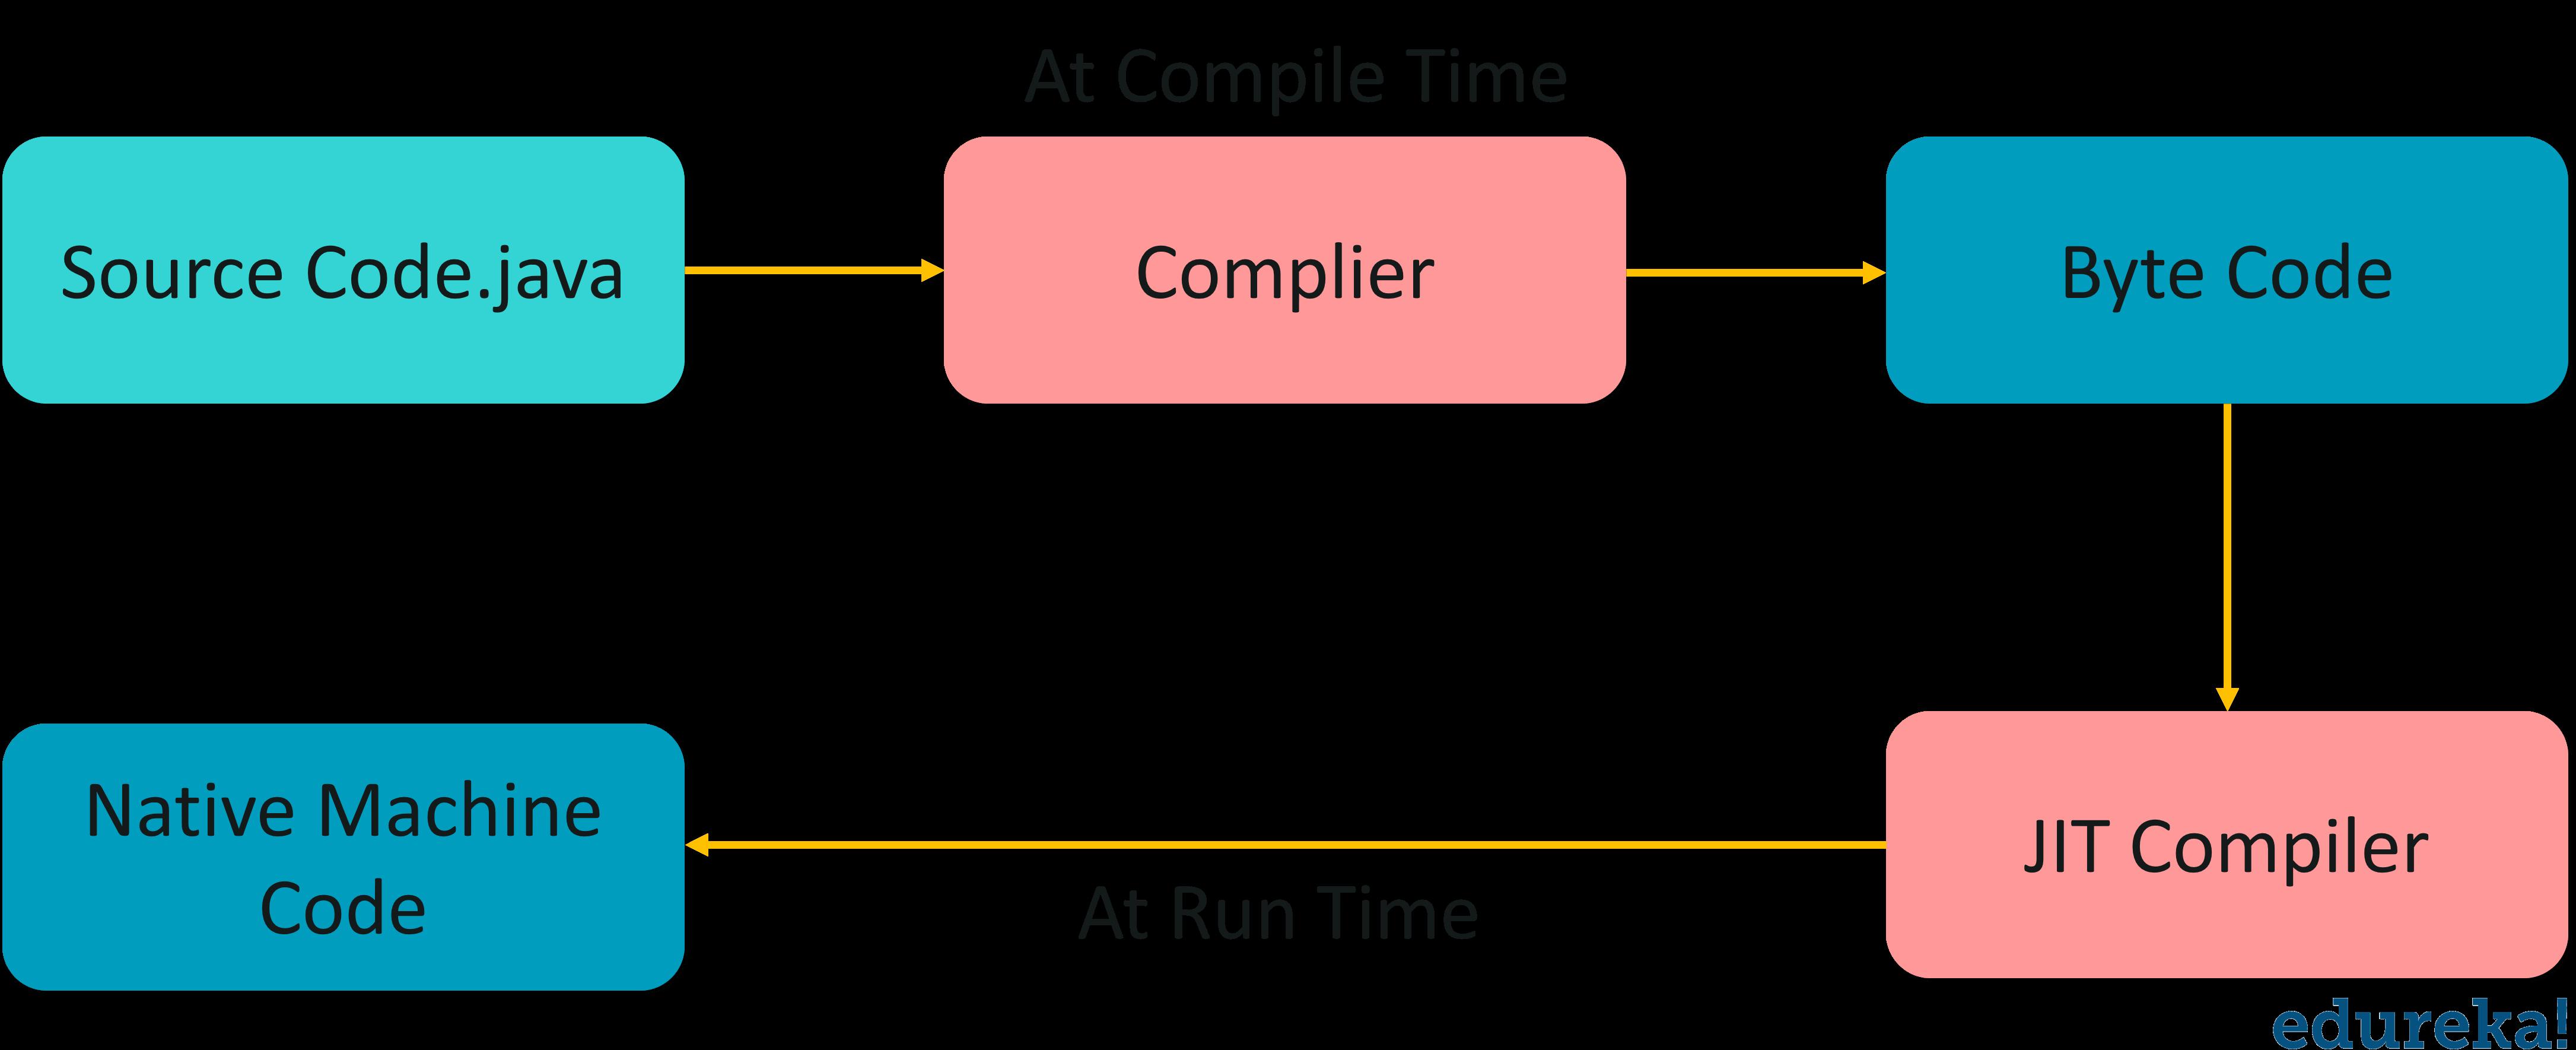 JIT Compiler - Java Architecture - Edureka